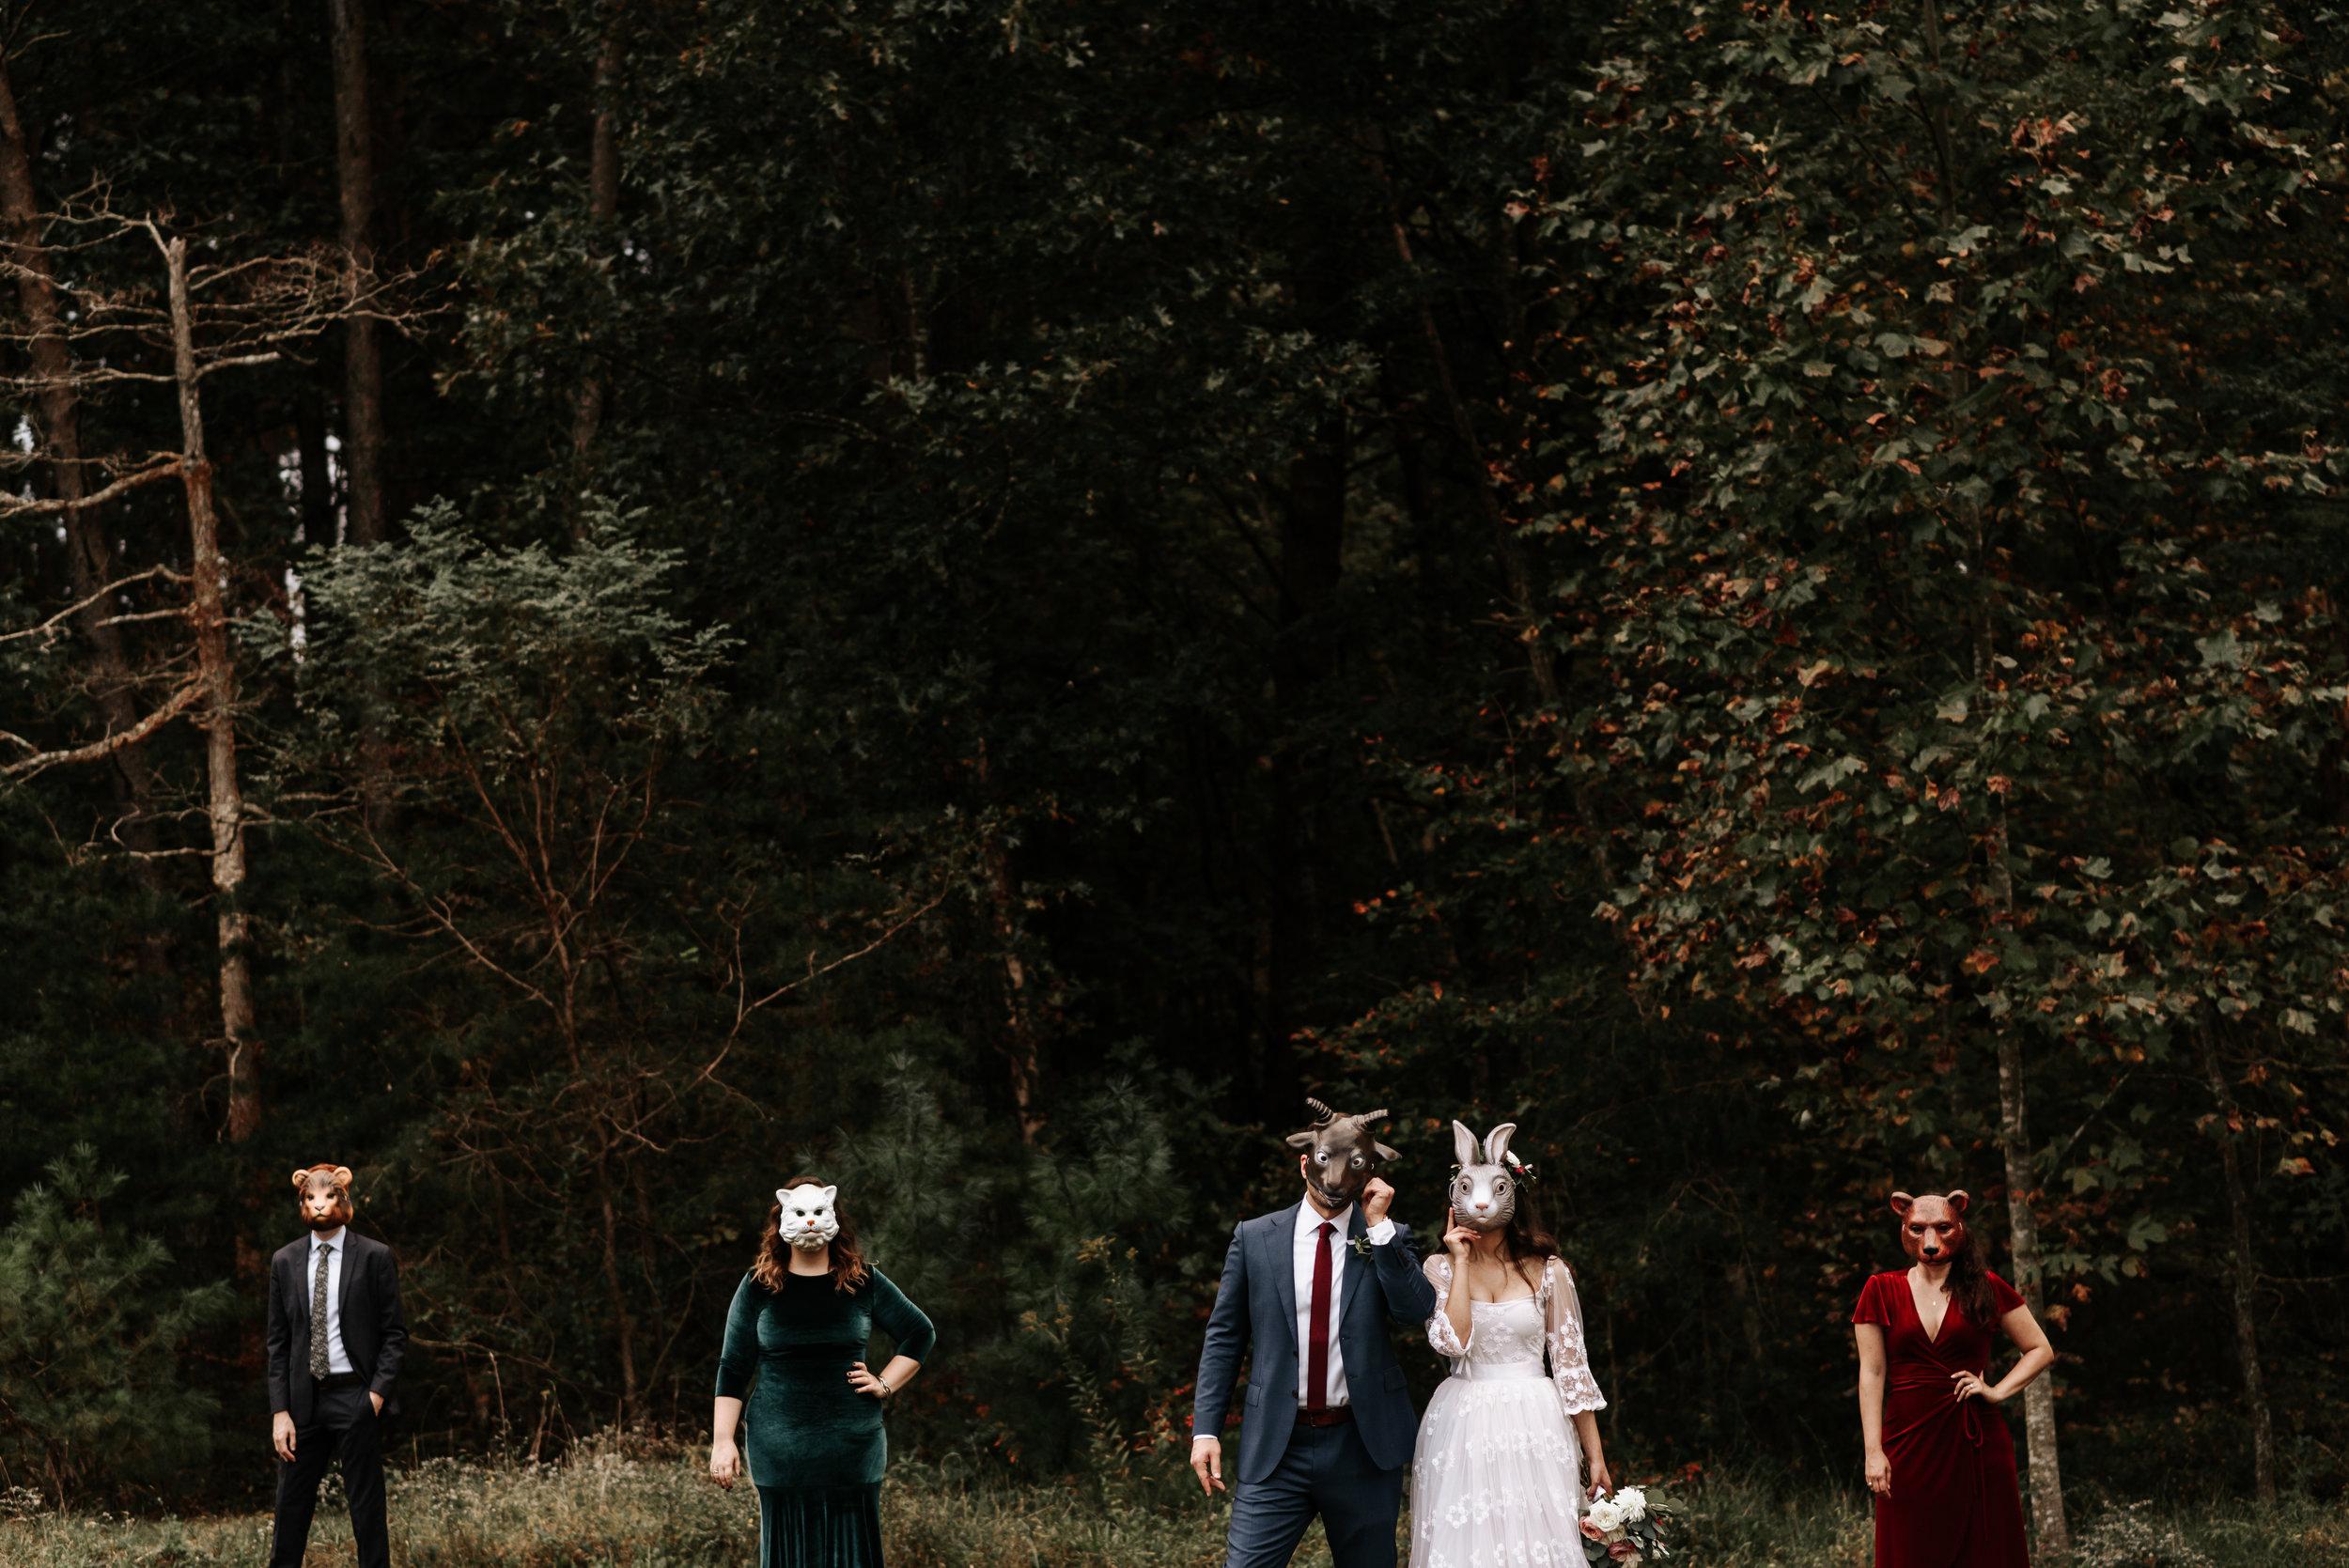 Veritas-Vineyards-and-Winery-Wedding-Photography-Afton-Virginia-Yasmin-Seth-Photography-by-V-2556.jpg